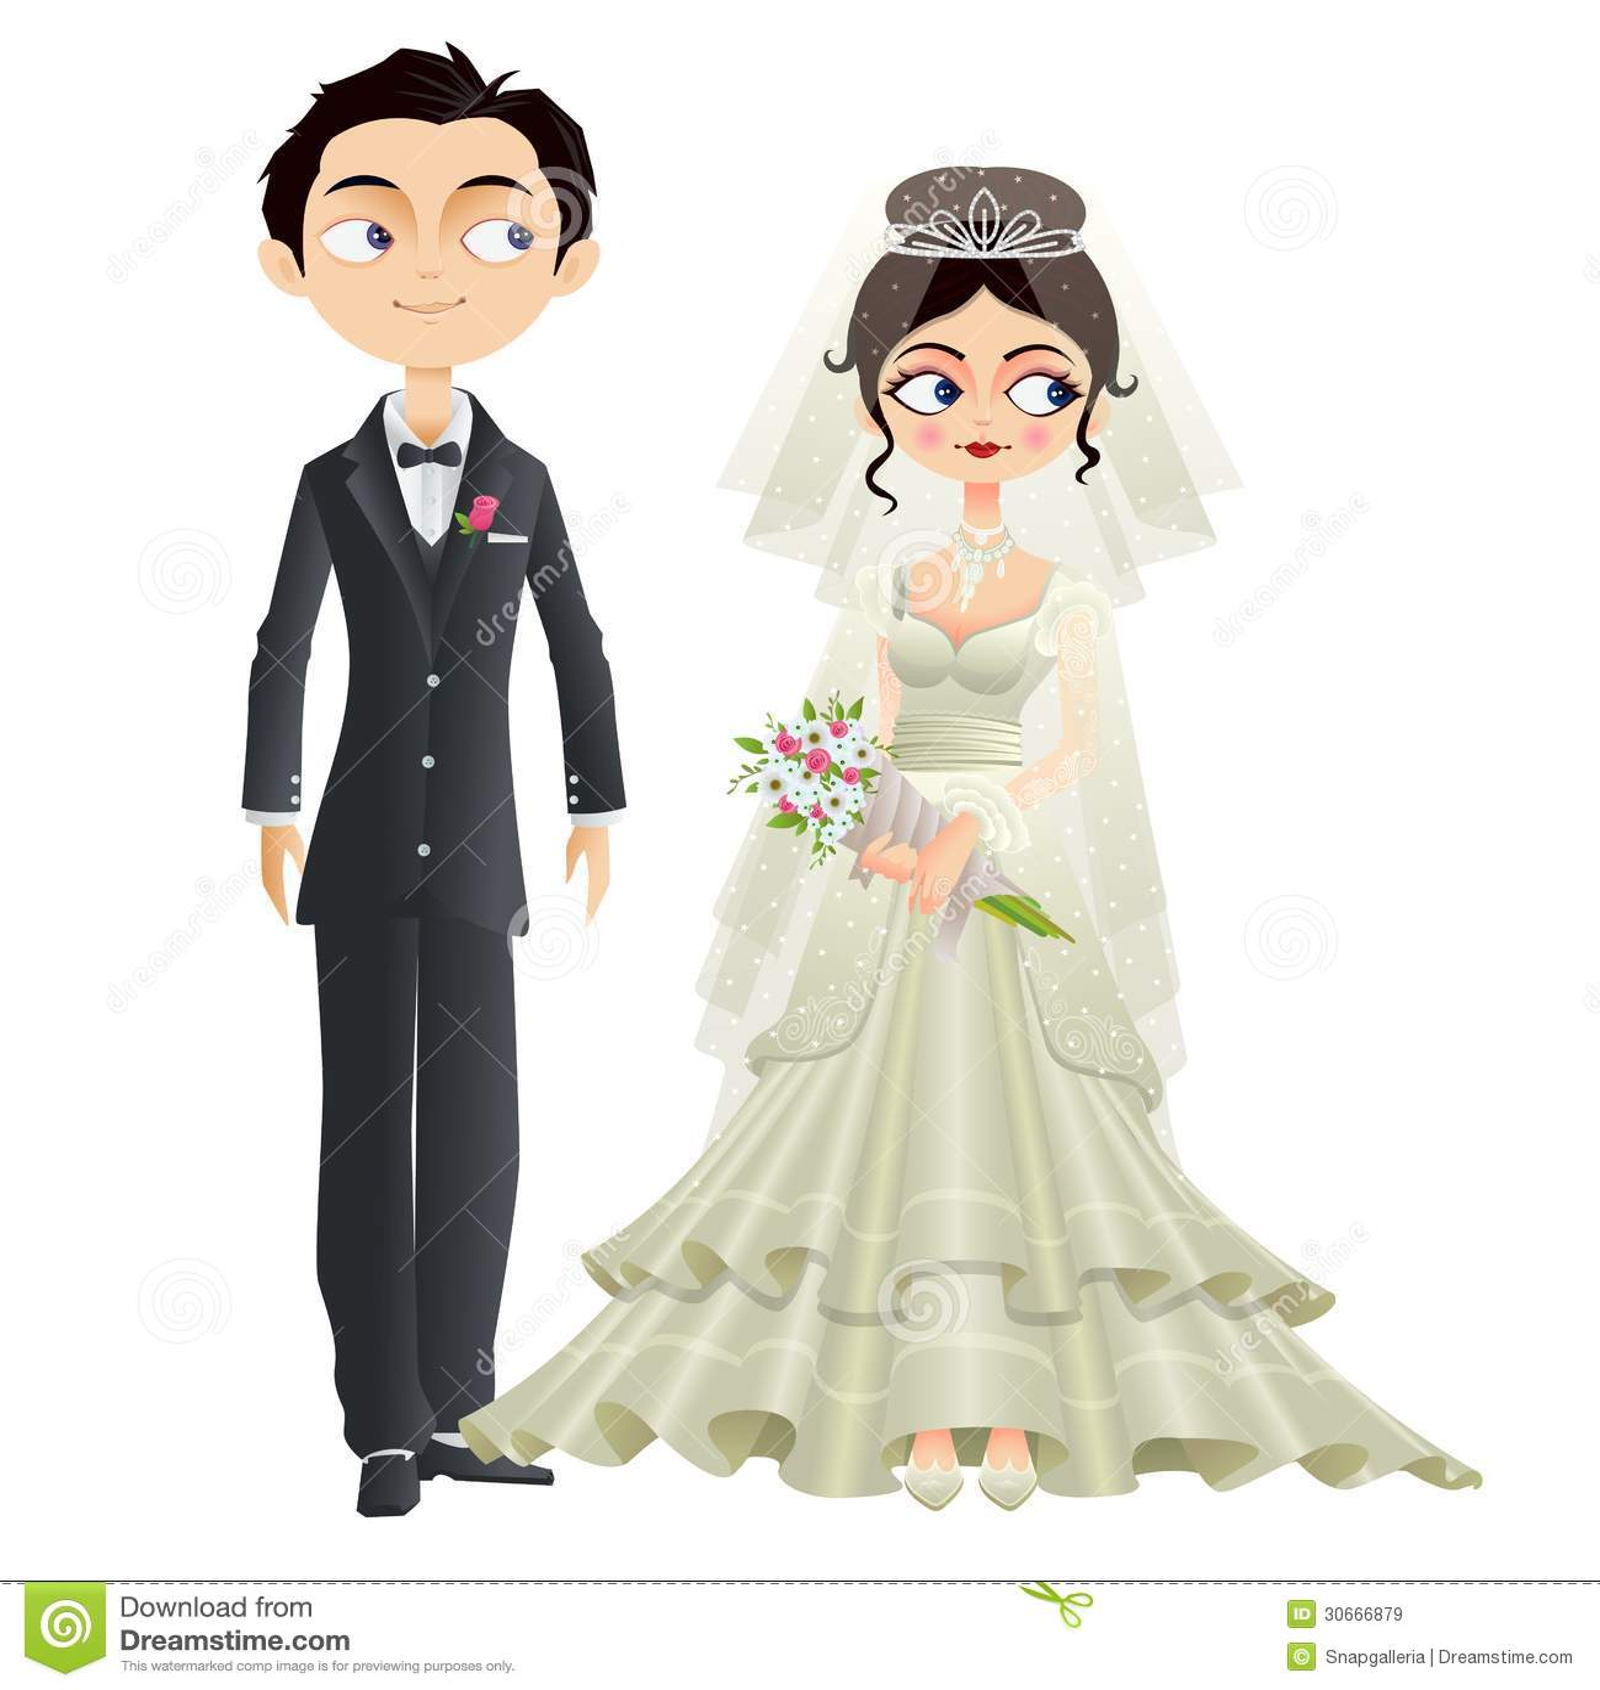 Christian Wedding Couple Royalty Free Stock Images Image